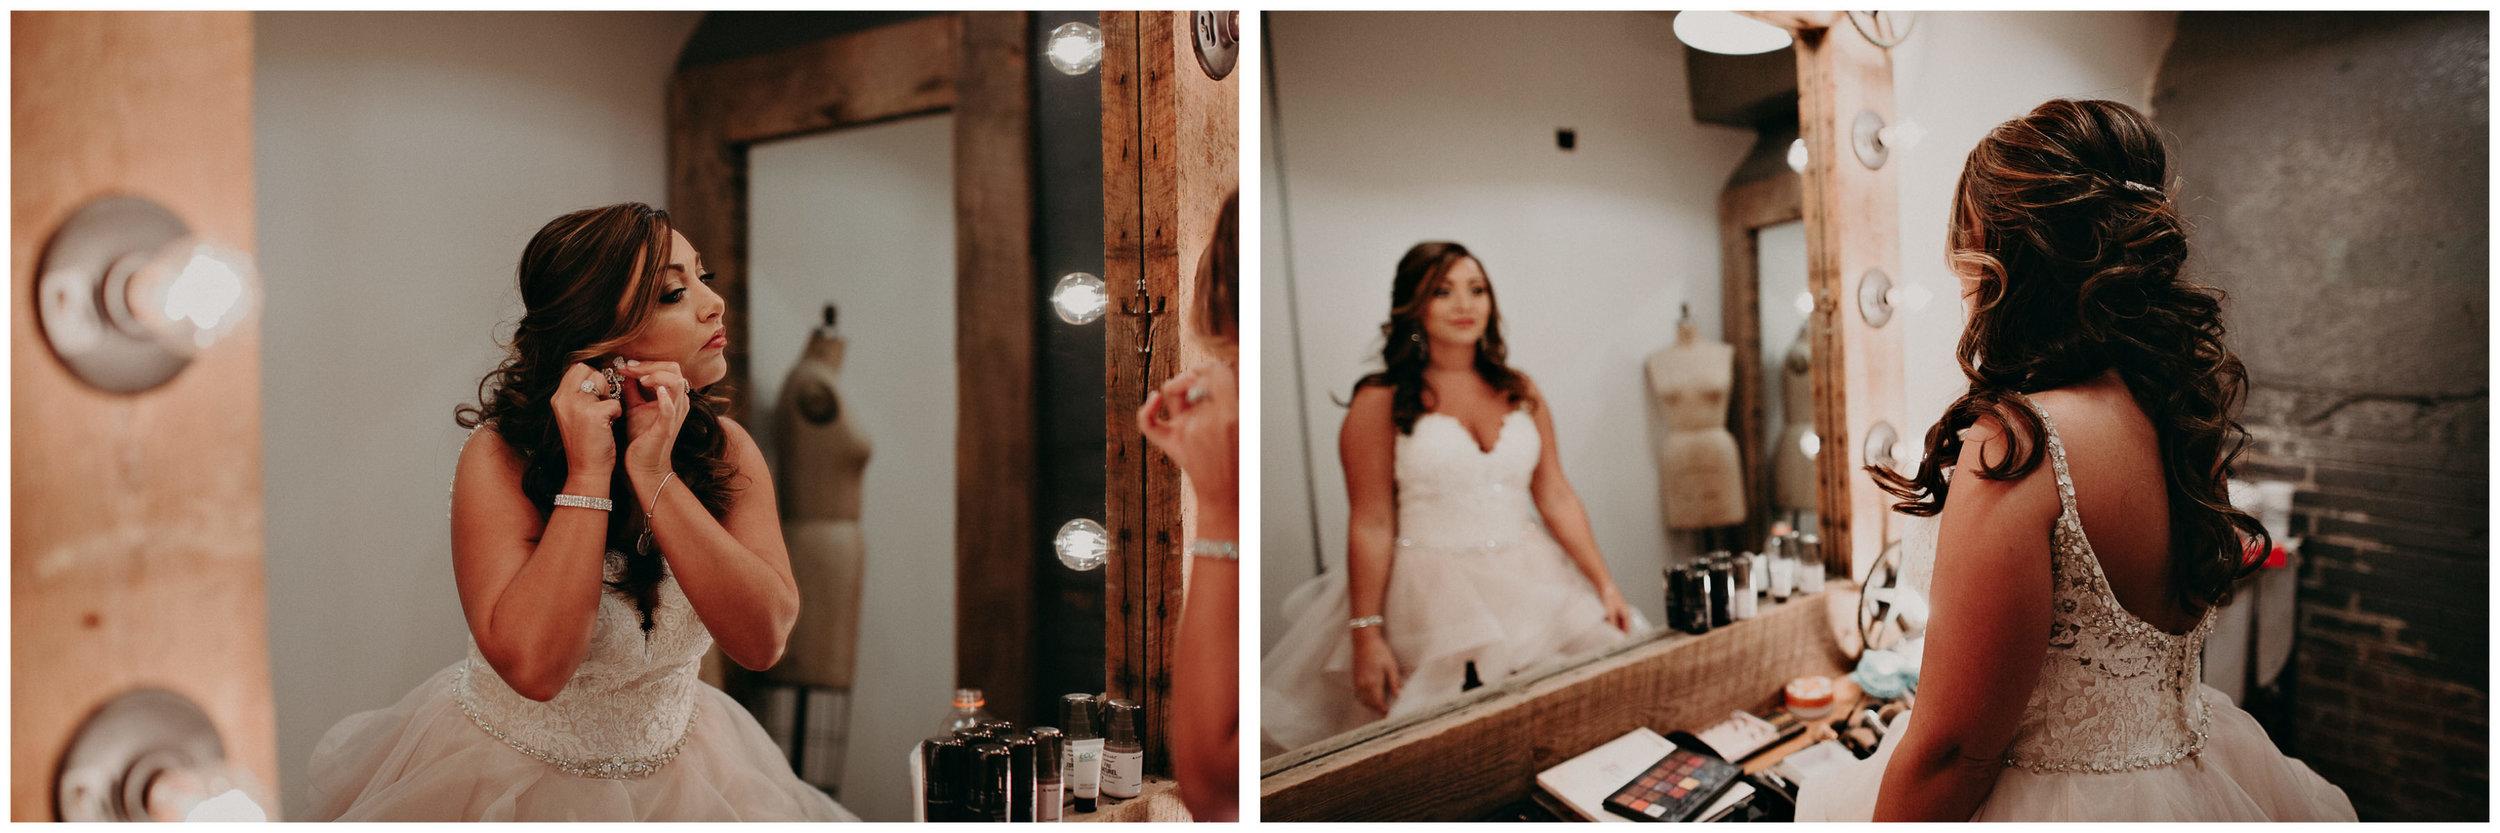 11 4 - Atlanta Wedding Photographer - The engine room - Ga - Wedding trends - Aline Marin Photography.jpg